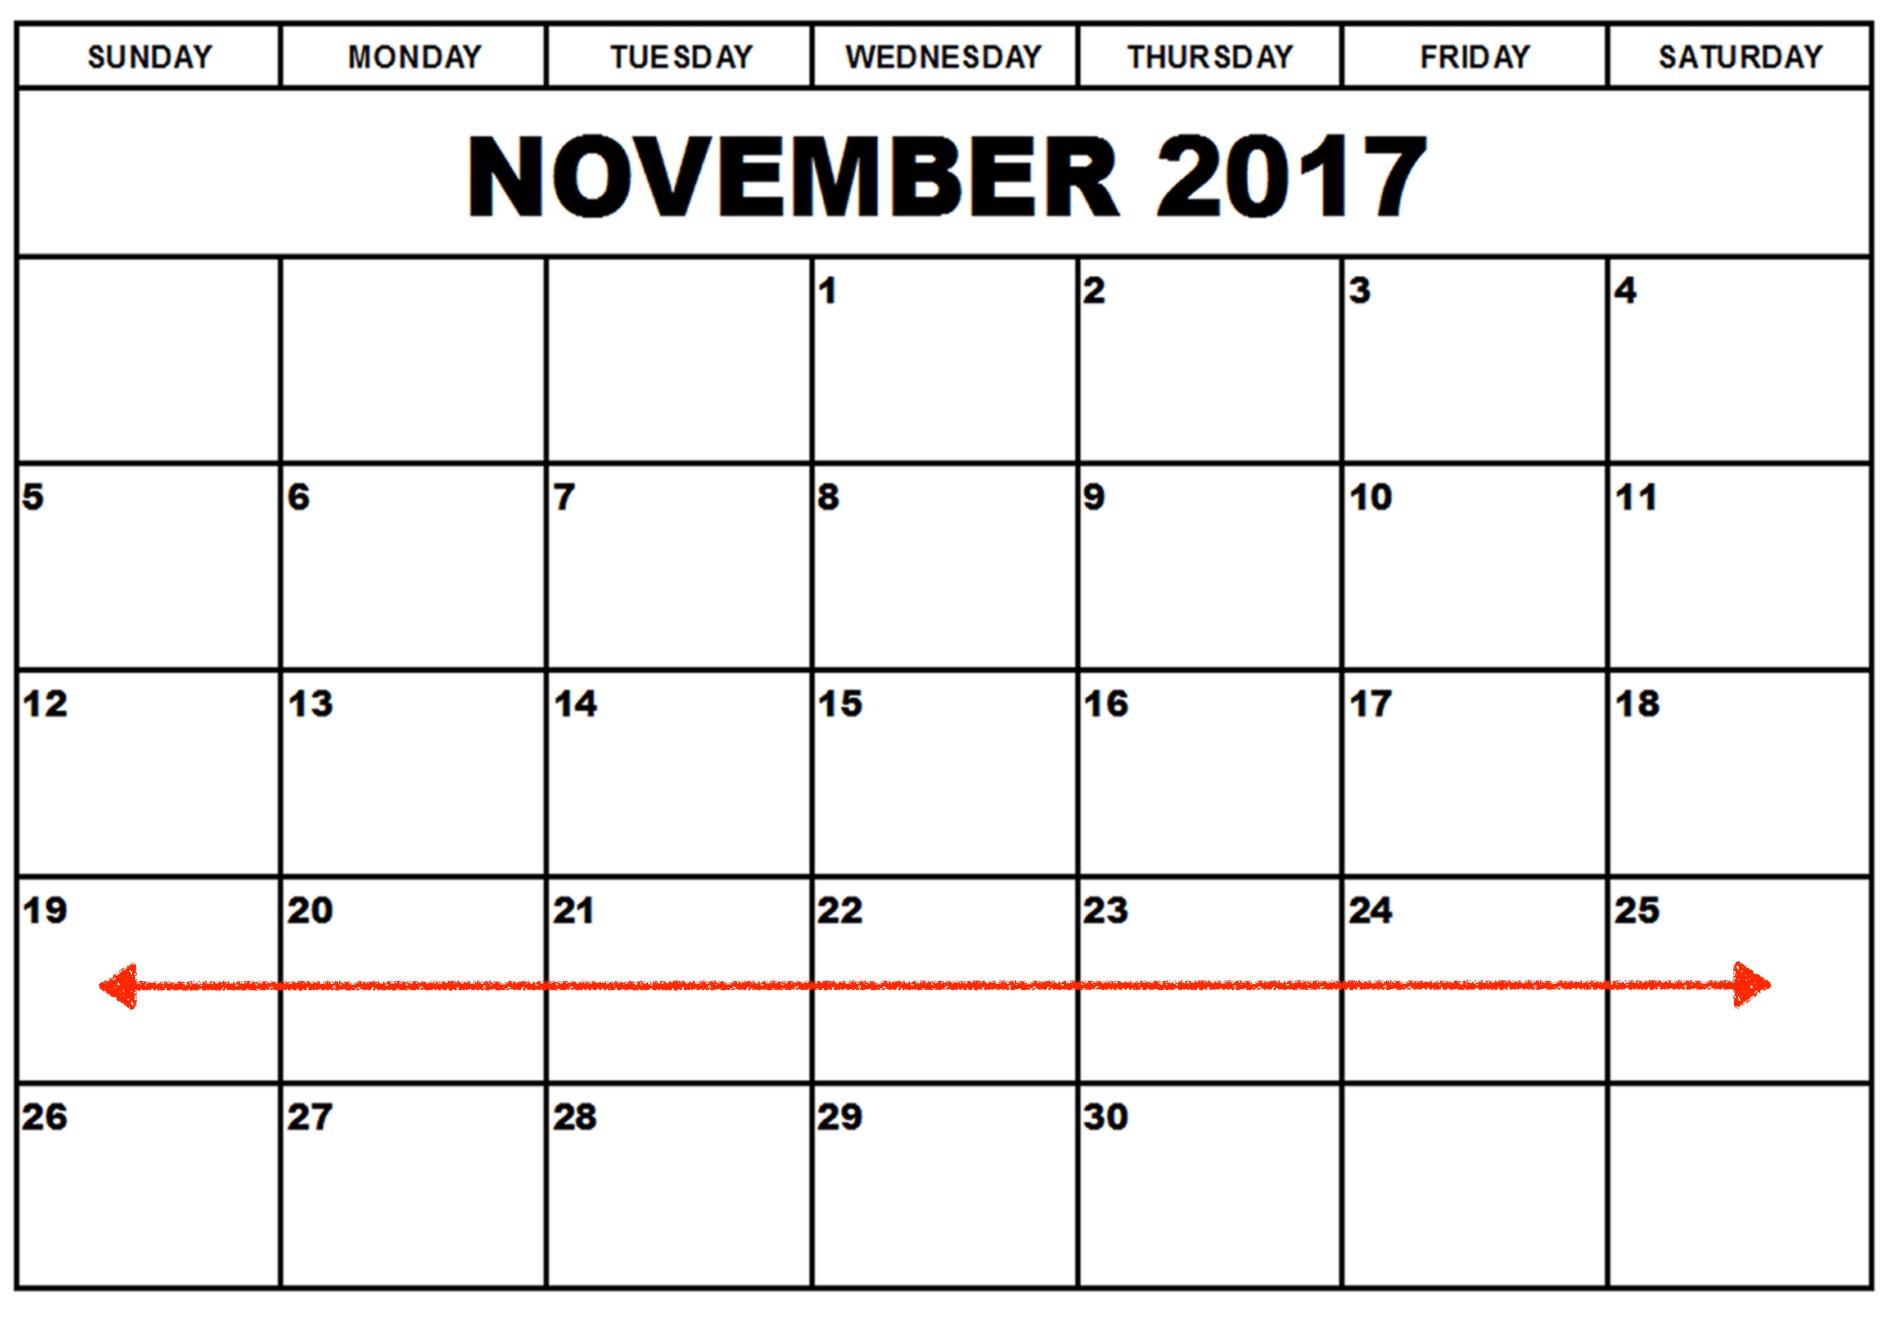 Week Two - November 19-25